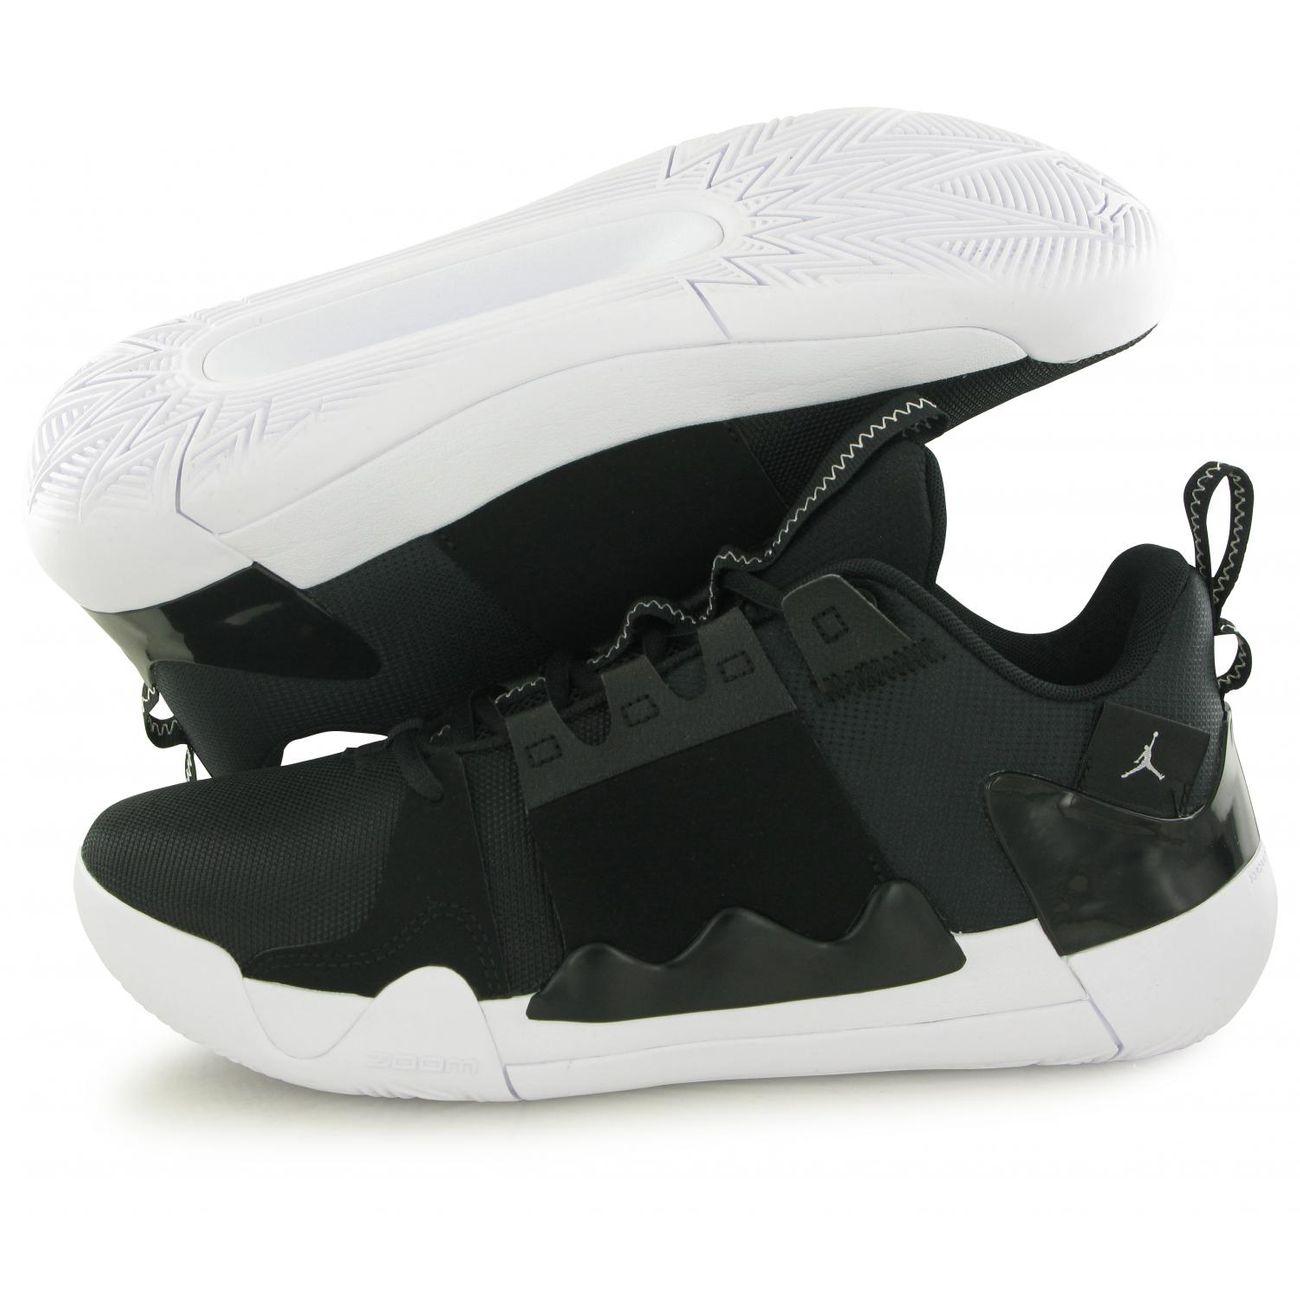 Ball Gravity Chaussures Nike Zero Basket Homme Jordan nOkNw8X0P